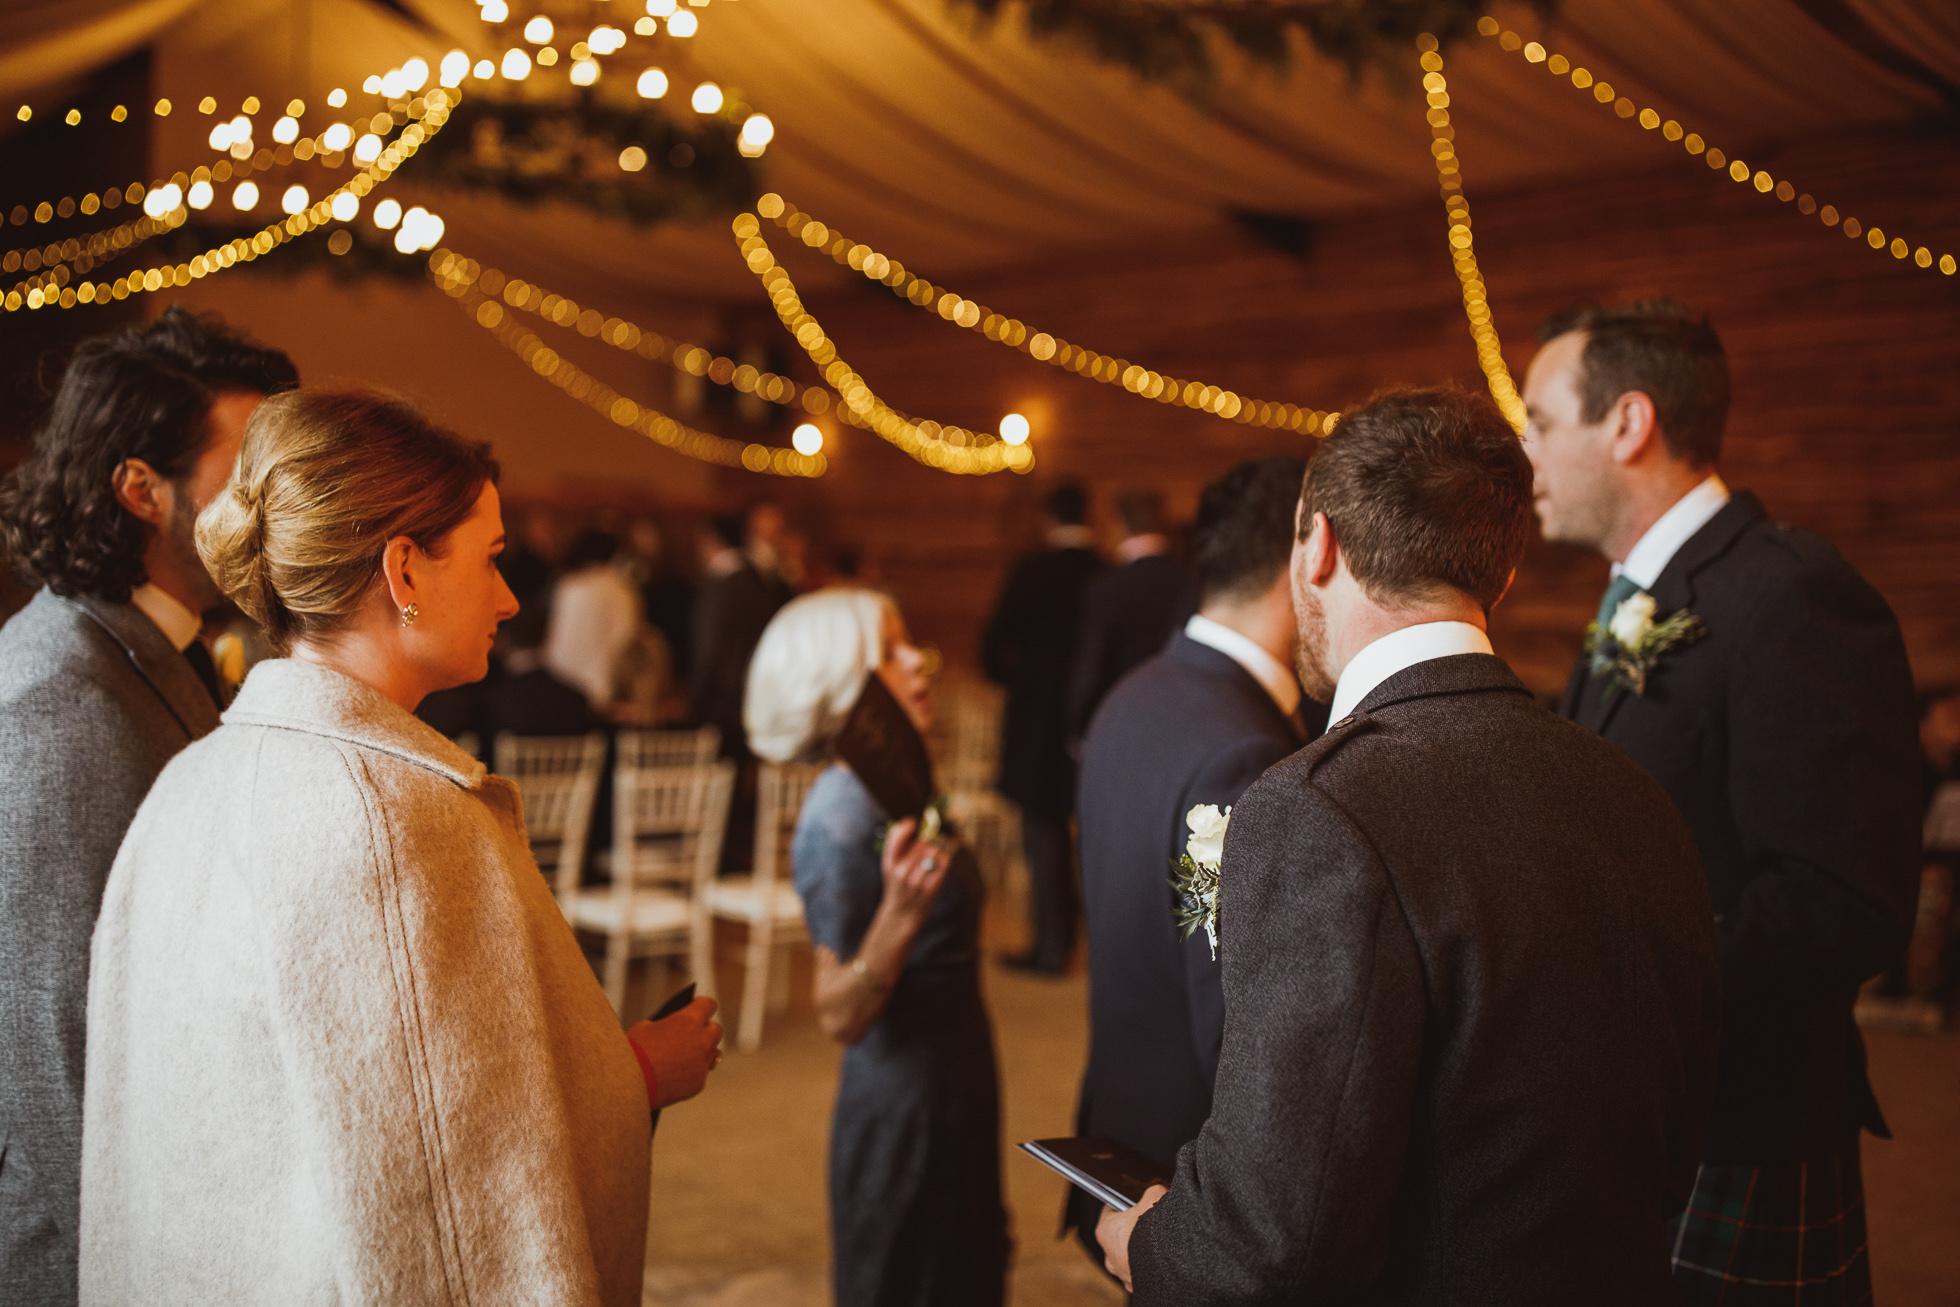 hornington_manor_wedding_photographer-34.jpg